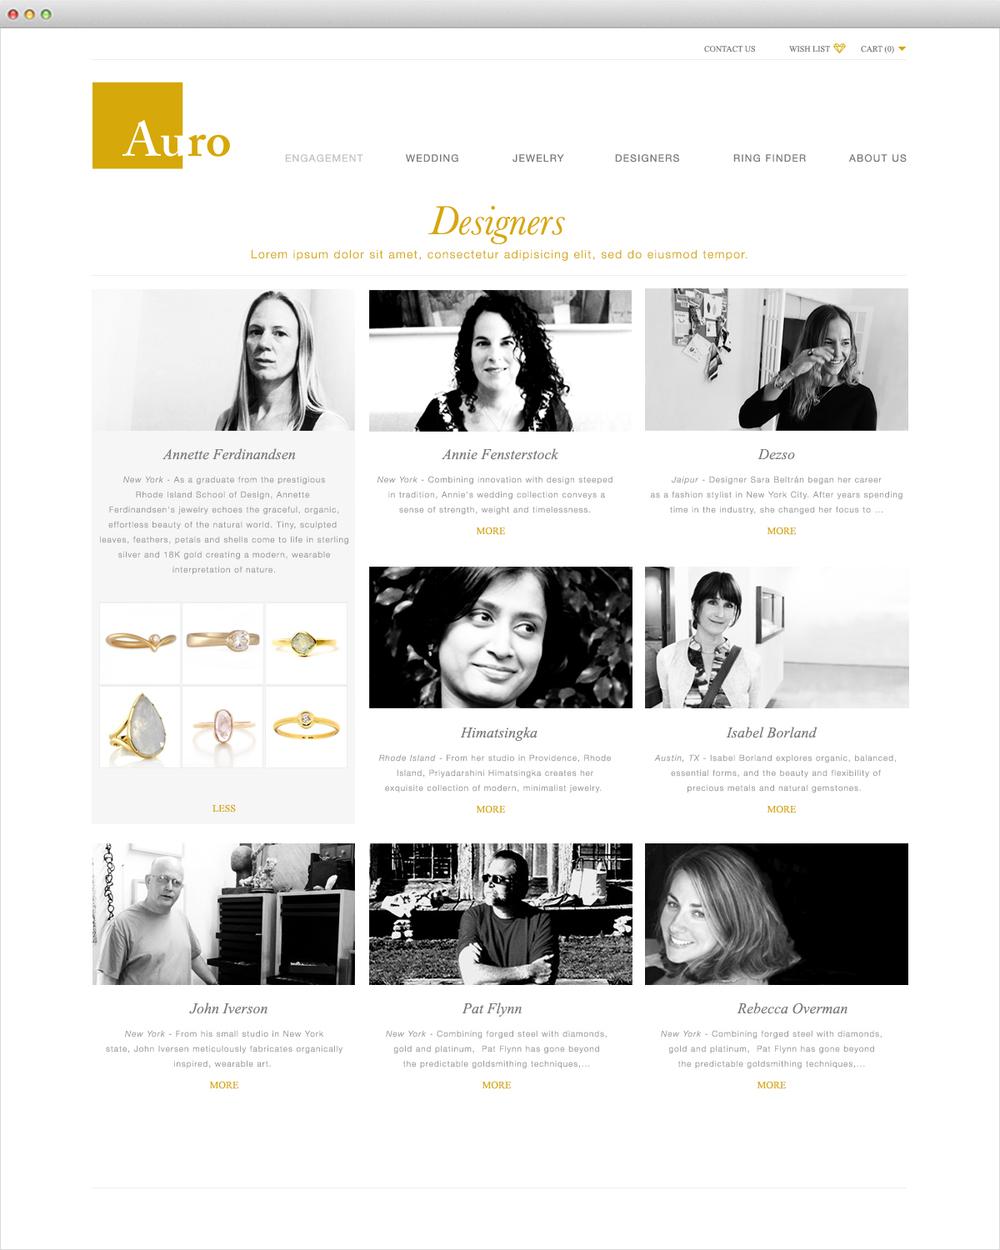 04auro_designers.jpg